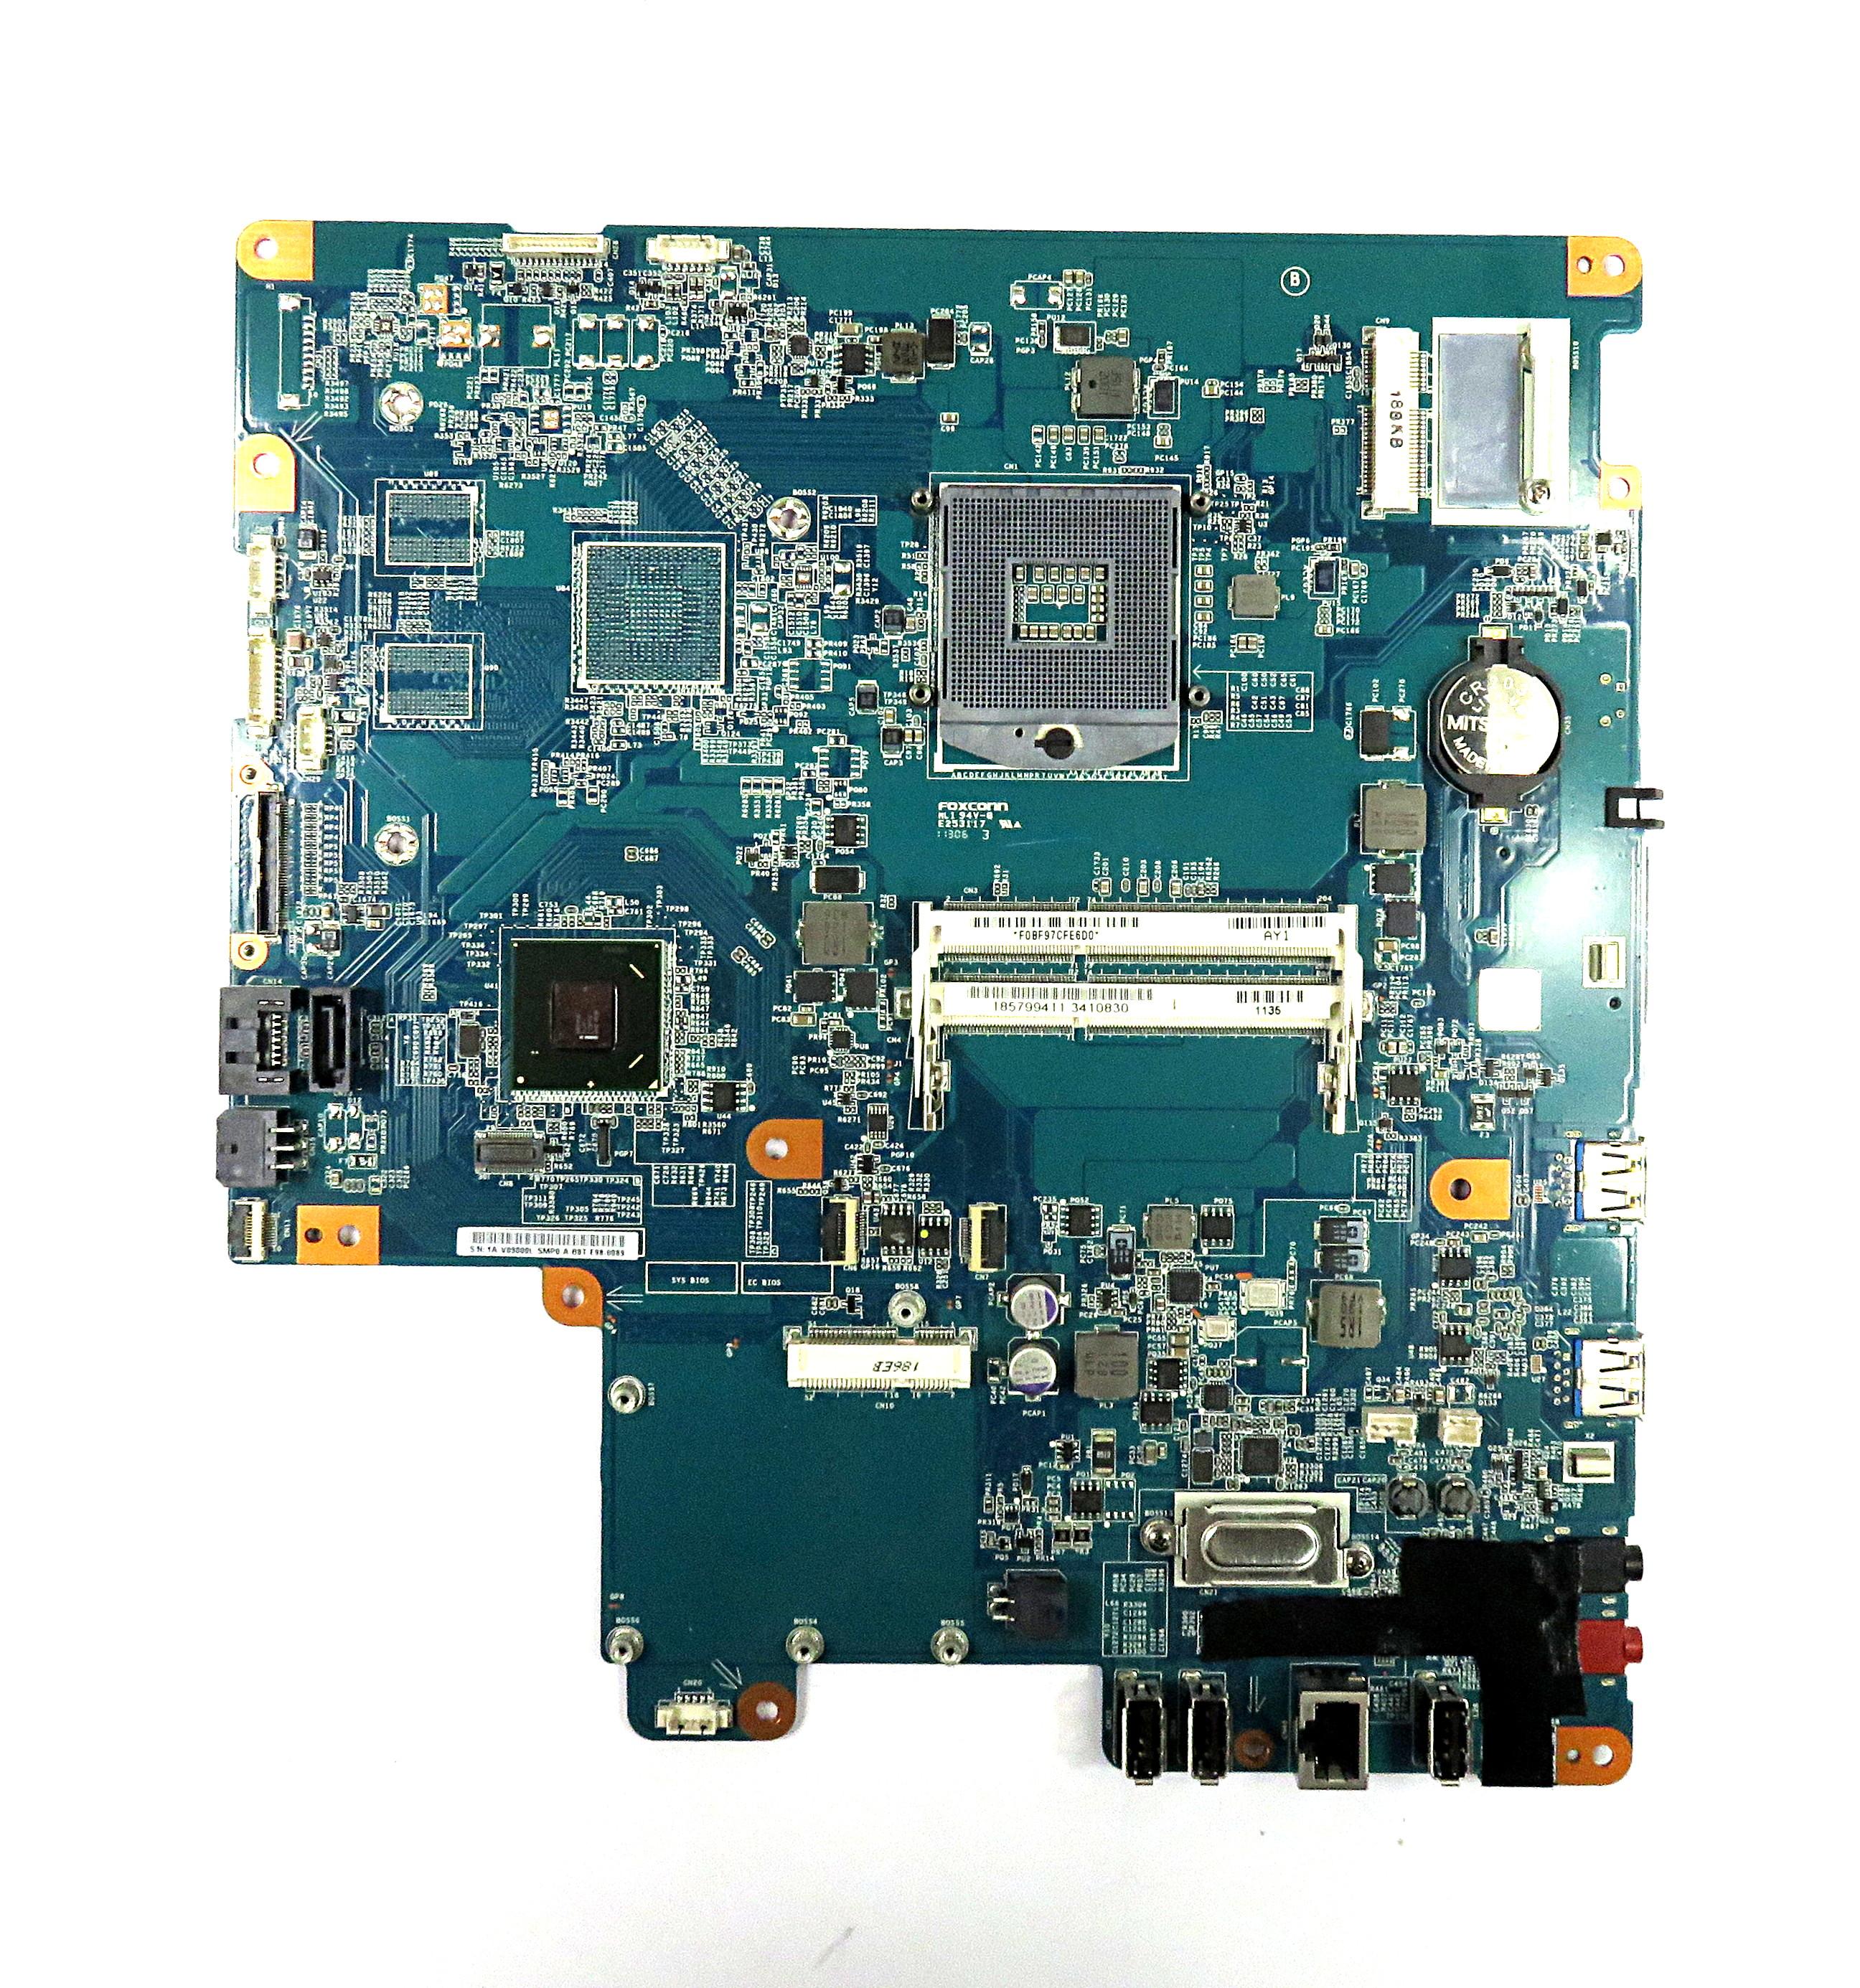 Sony rPGA-988B Motherboard MB f/ PCG-11411M AiO 1P-0113J03-6011 185799411